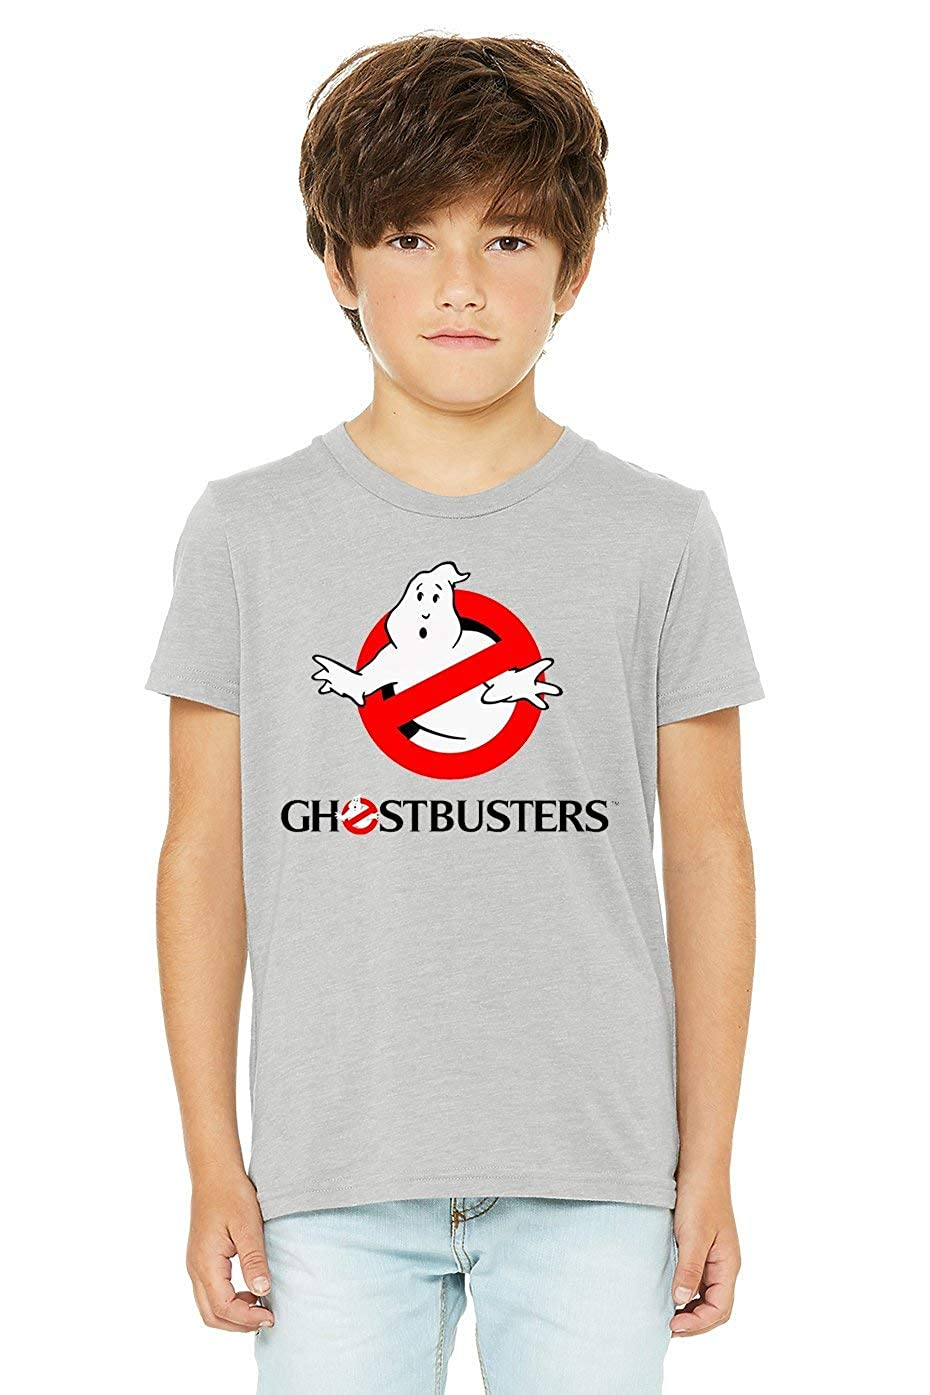 b347a479e Amazon.com: LivingTees Ghostbusters Kids and Toddler Shirt: Clothing